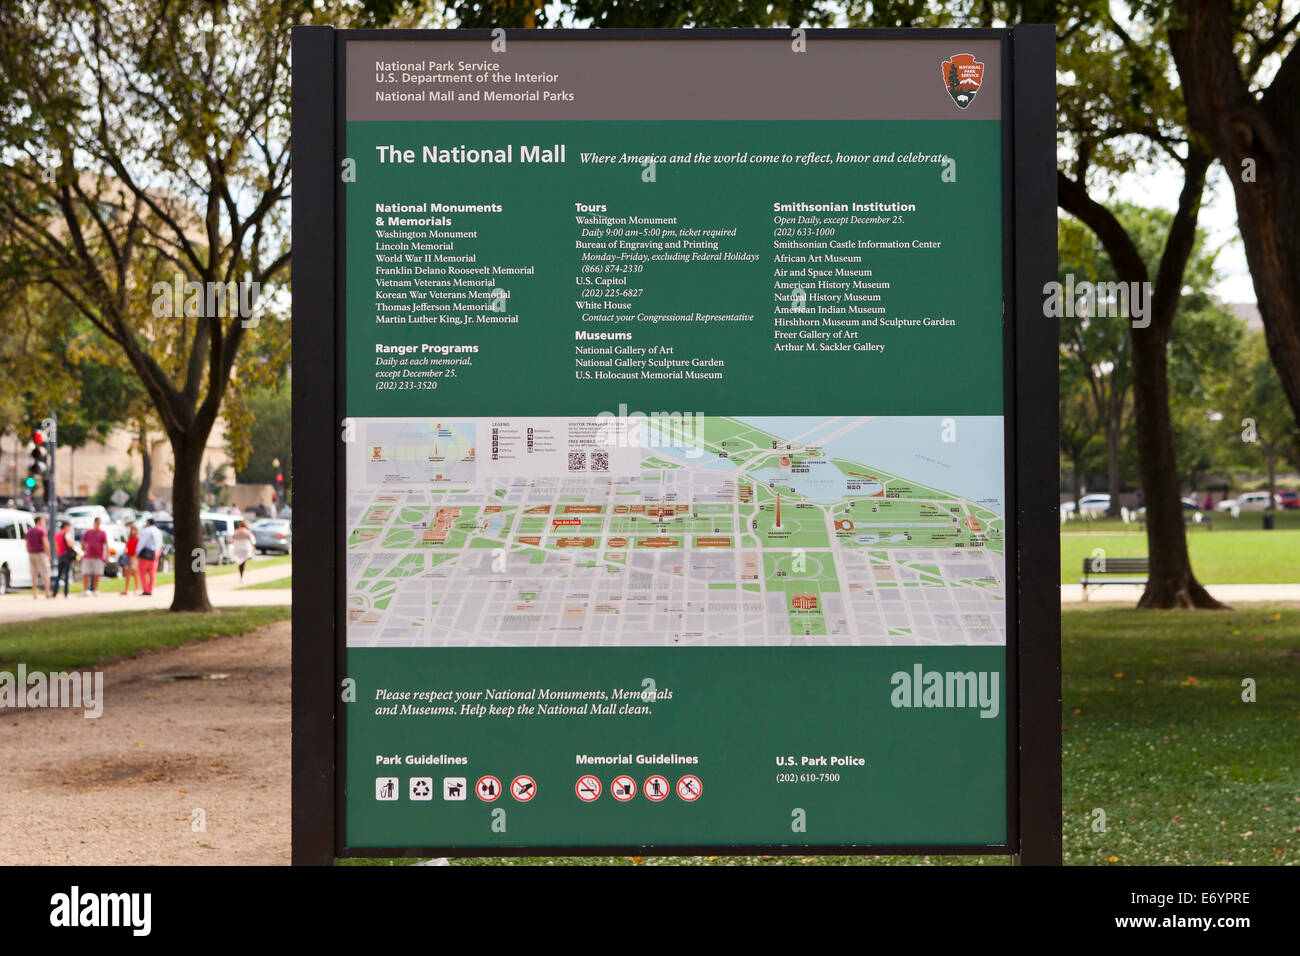 Guide map of The National Mall - Washington, DC USA Stock Photo ...